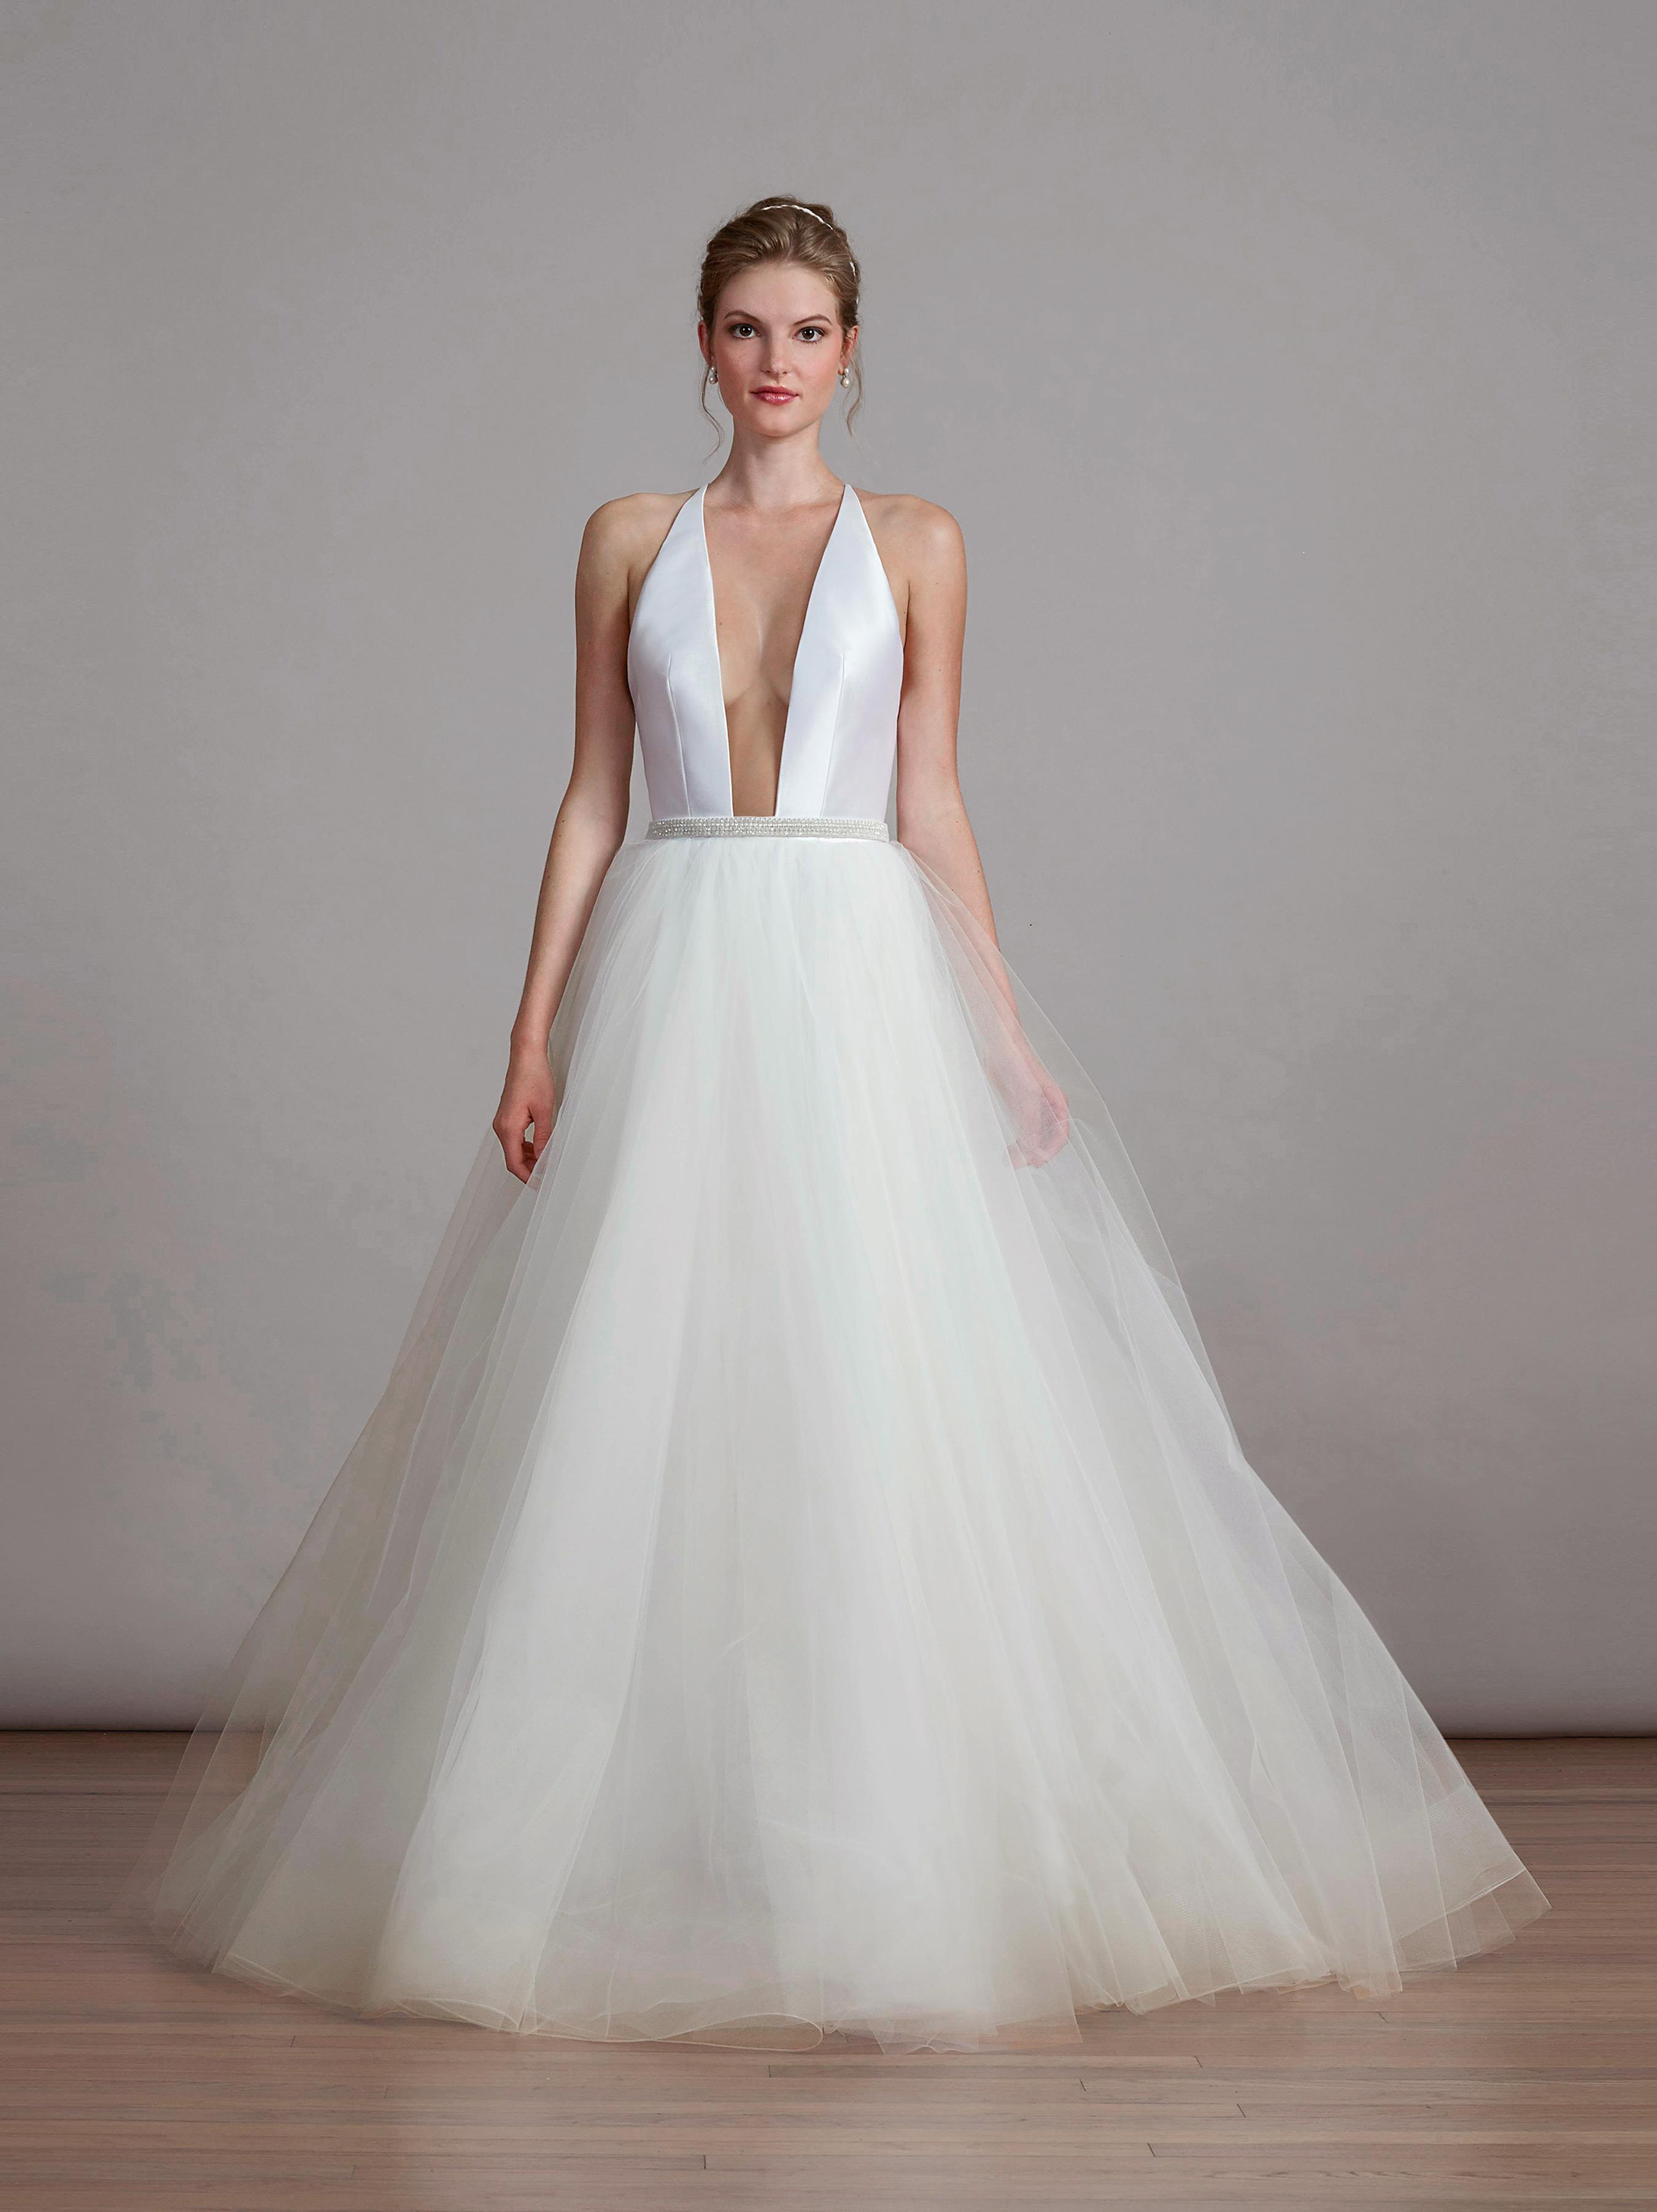 liancarlo halter wedding dress with tulle